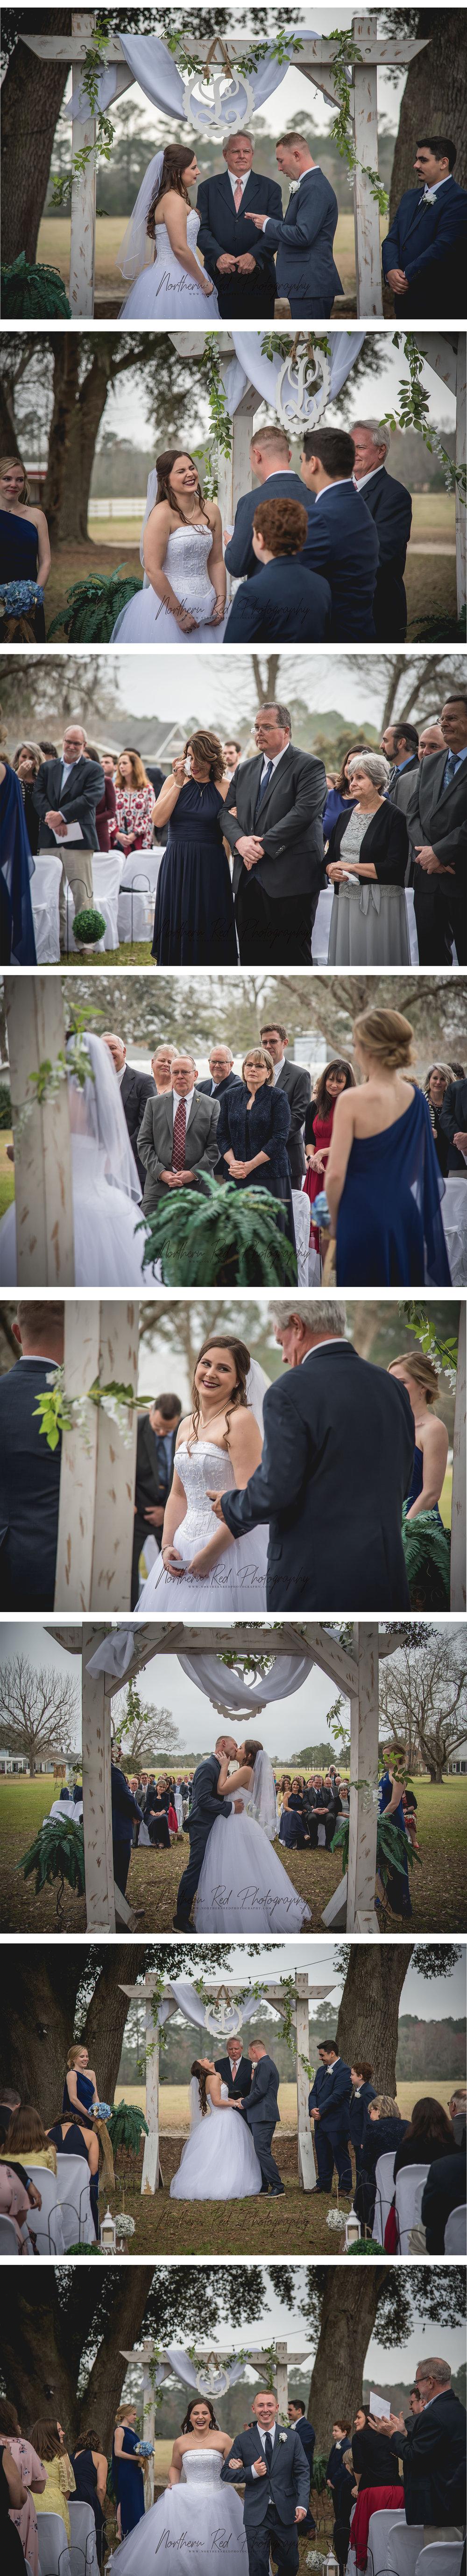 South Carolina Wedding Photographer | Northern Red Photography